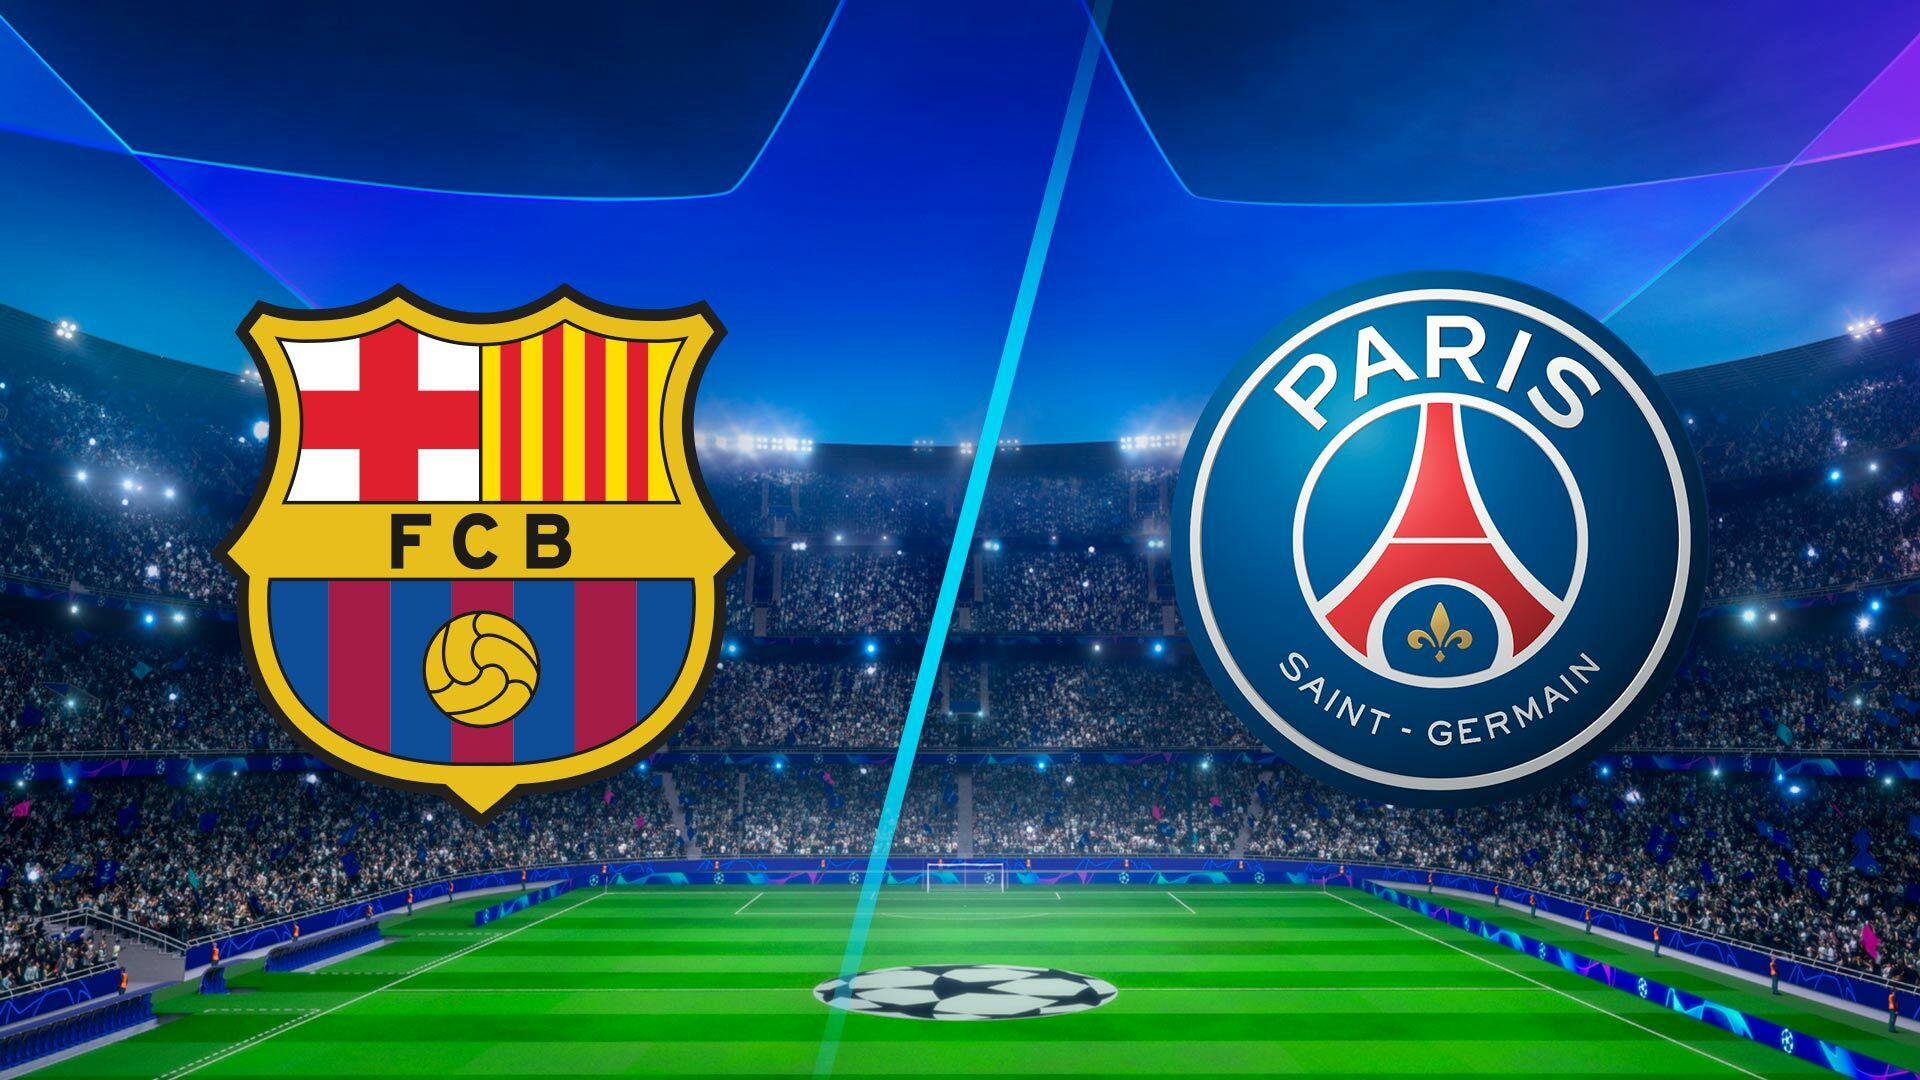 watch uefa champions league season 2021 episode 110 barcelona vs psg full show on paramount plus